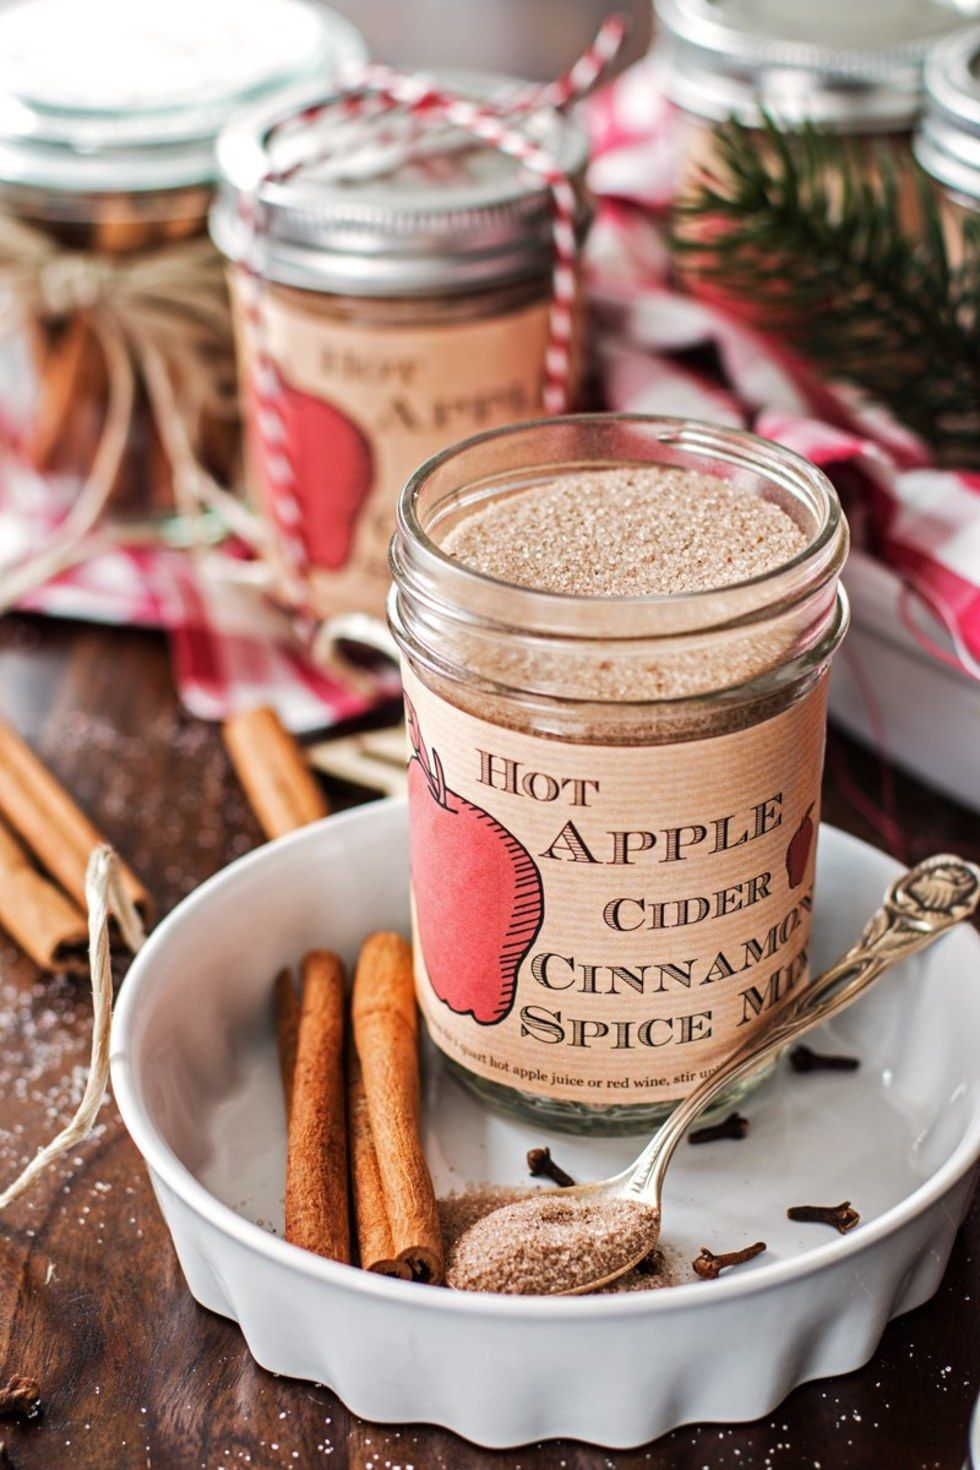 Hot Apple Cider Cinnamon Spice Mix   Gifts   Pinterest   Hot apple ...